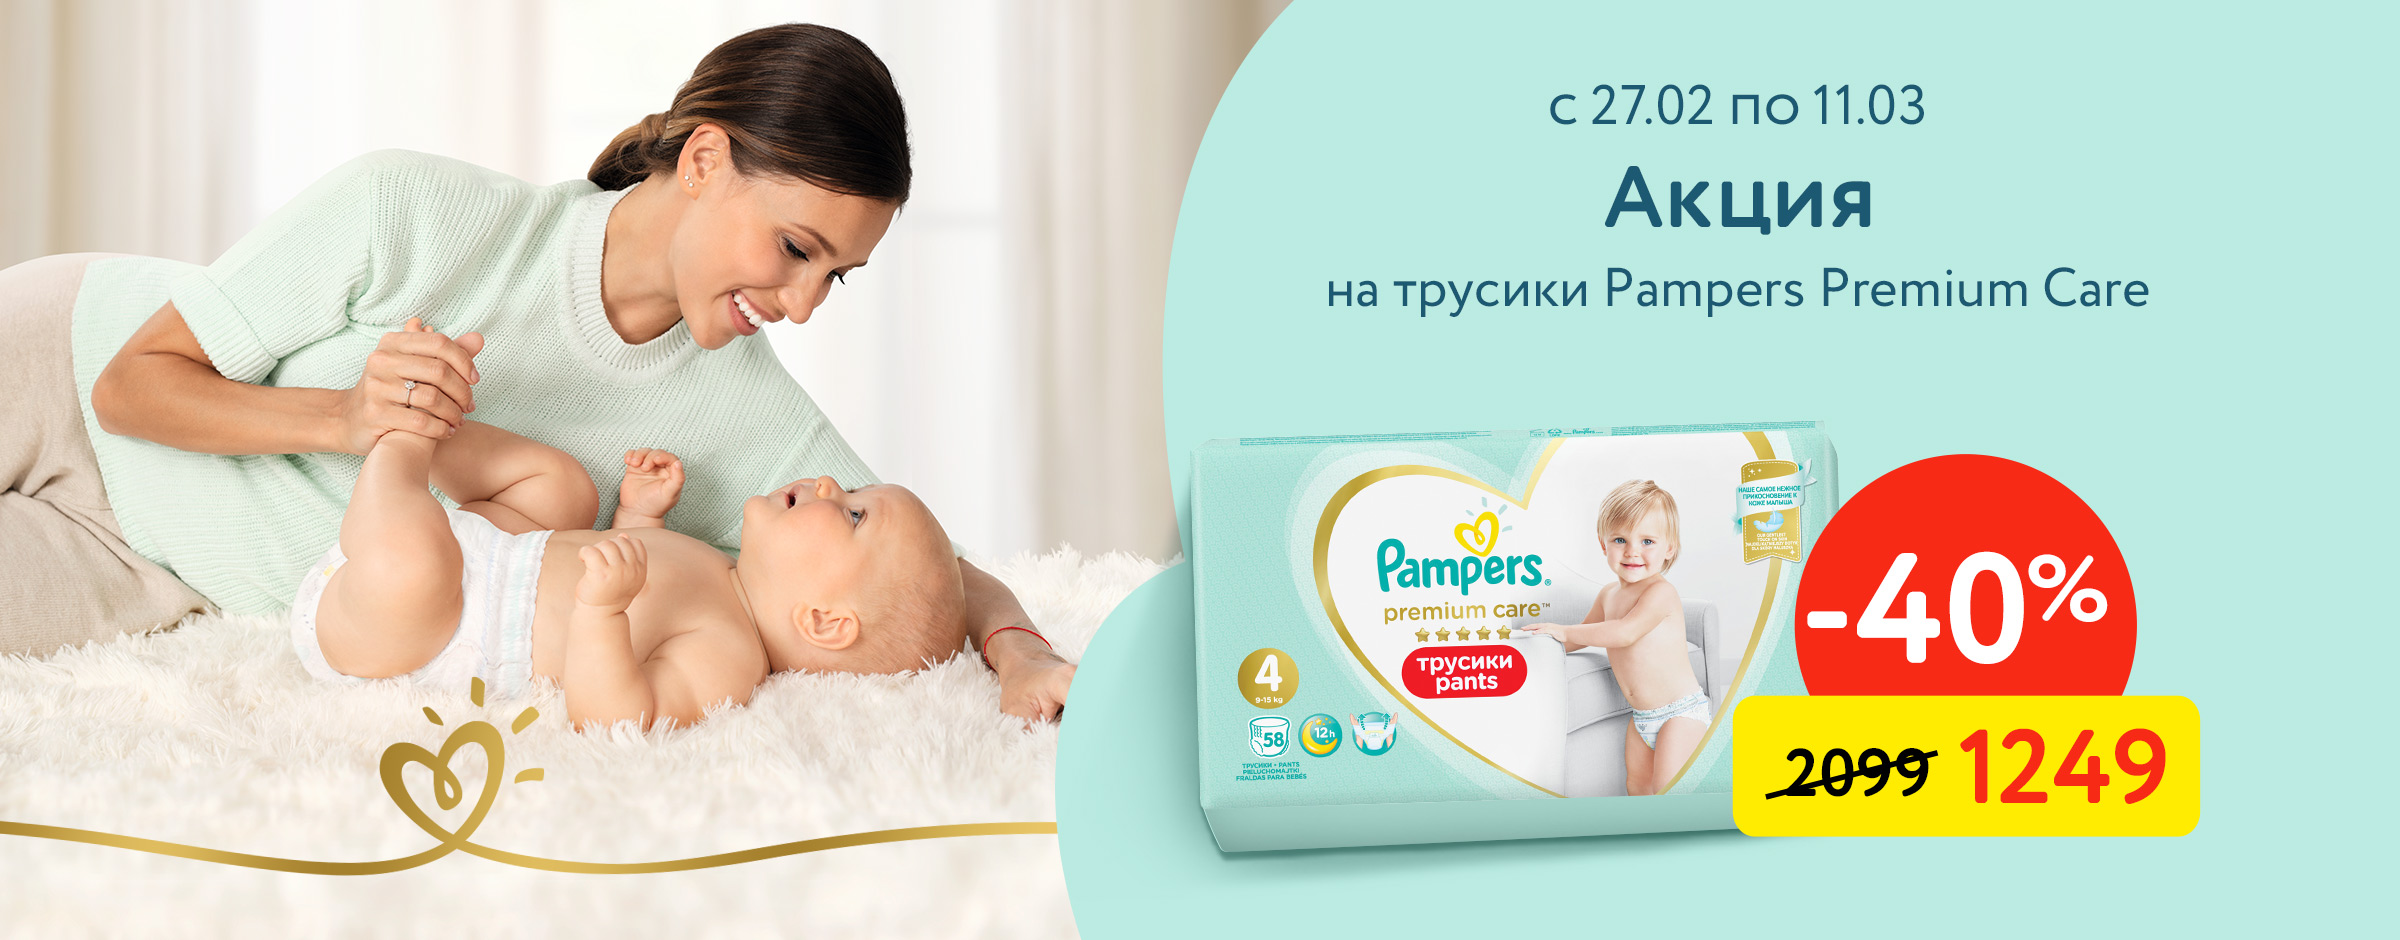 40% на трусики Pampers Premium care Трусики